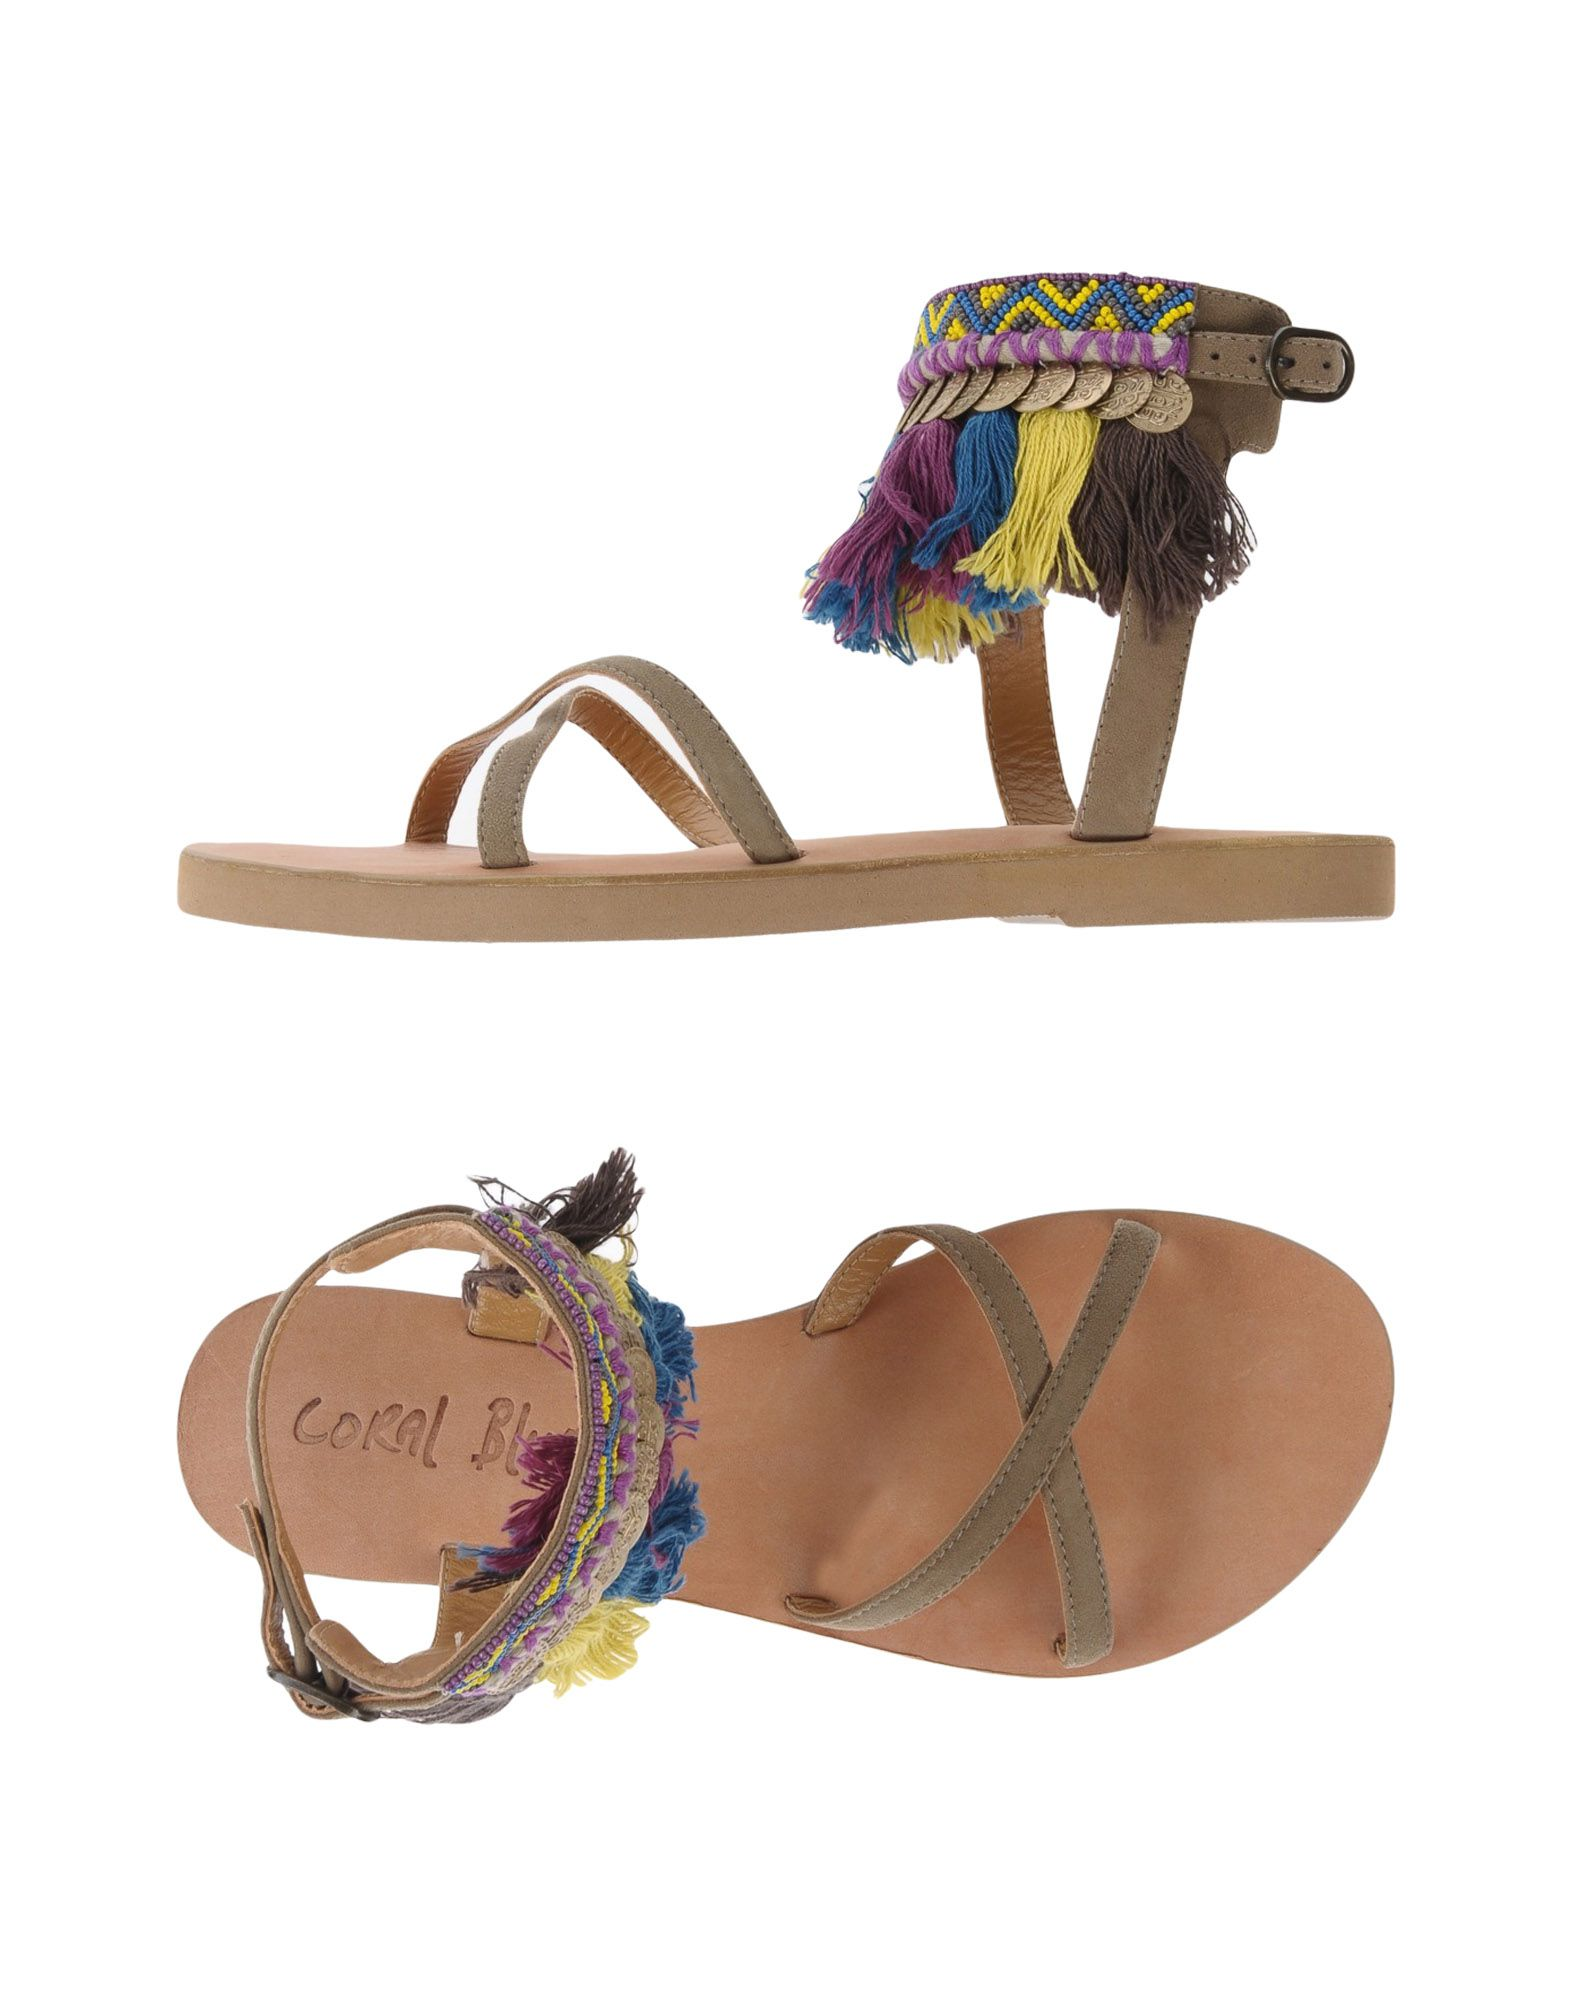 CORAL BLUE Sandals in Khaki